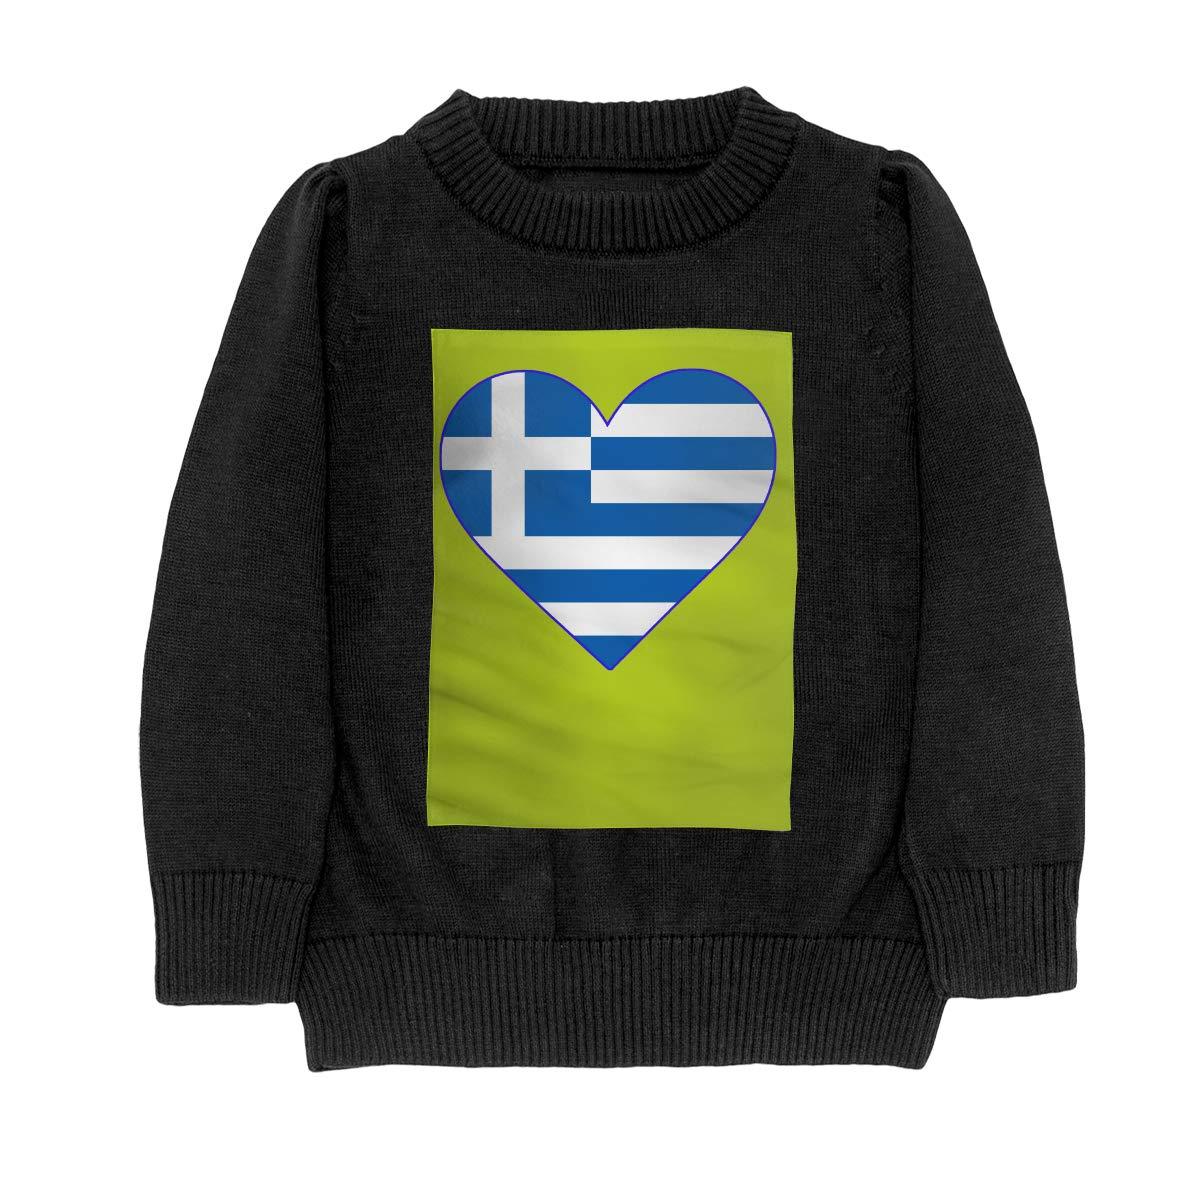 WWTBBJ-B Flag of Greece Casual Adolescent Boys /& Girls Unisex Sweater Keep Warm